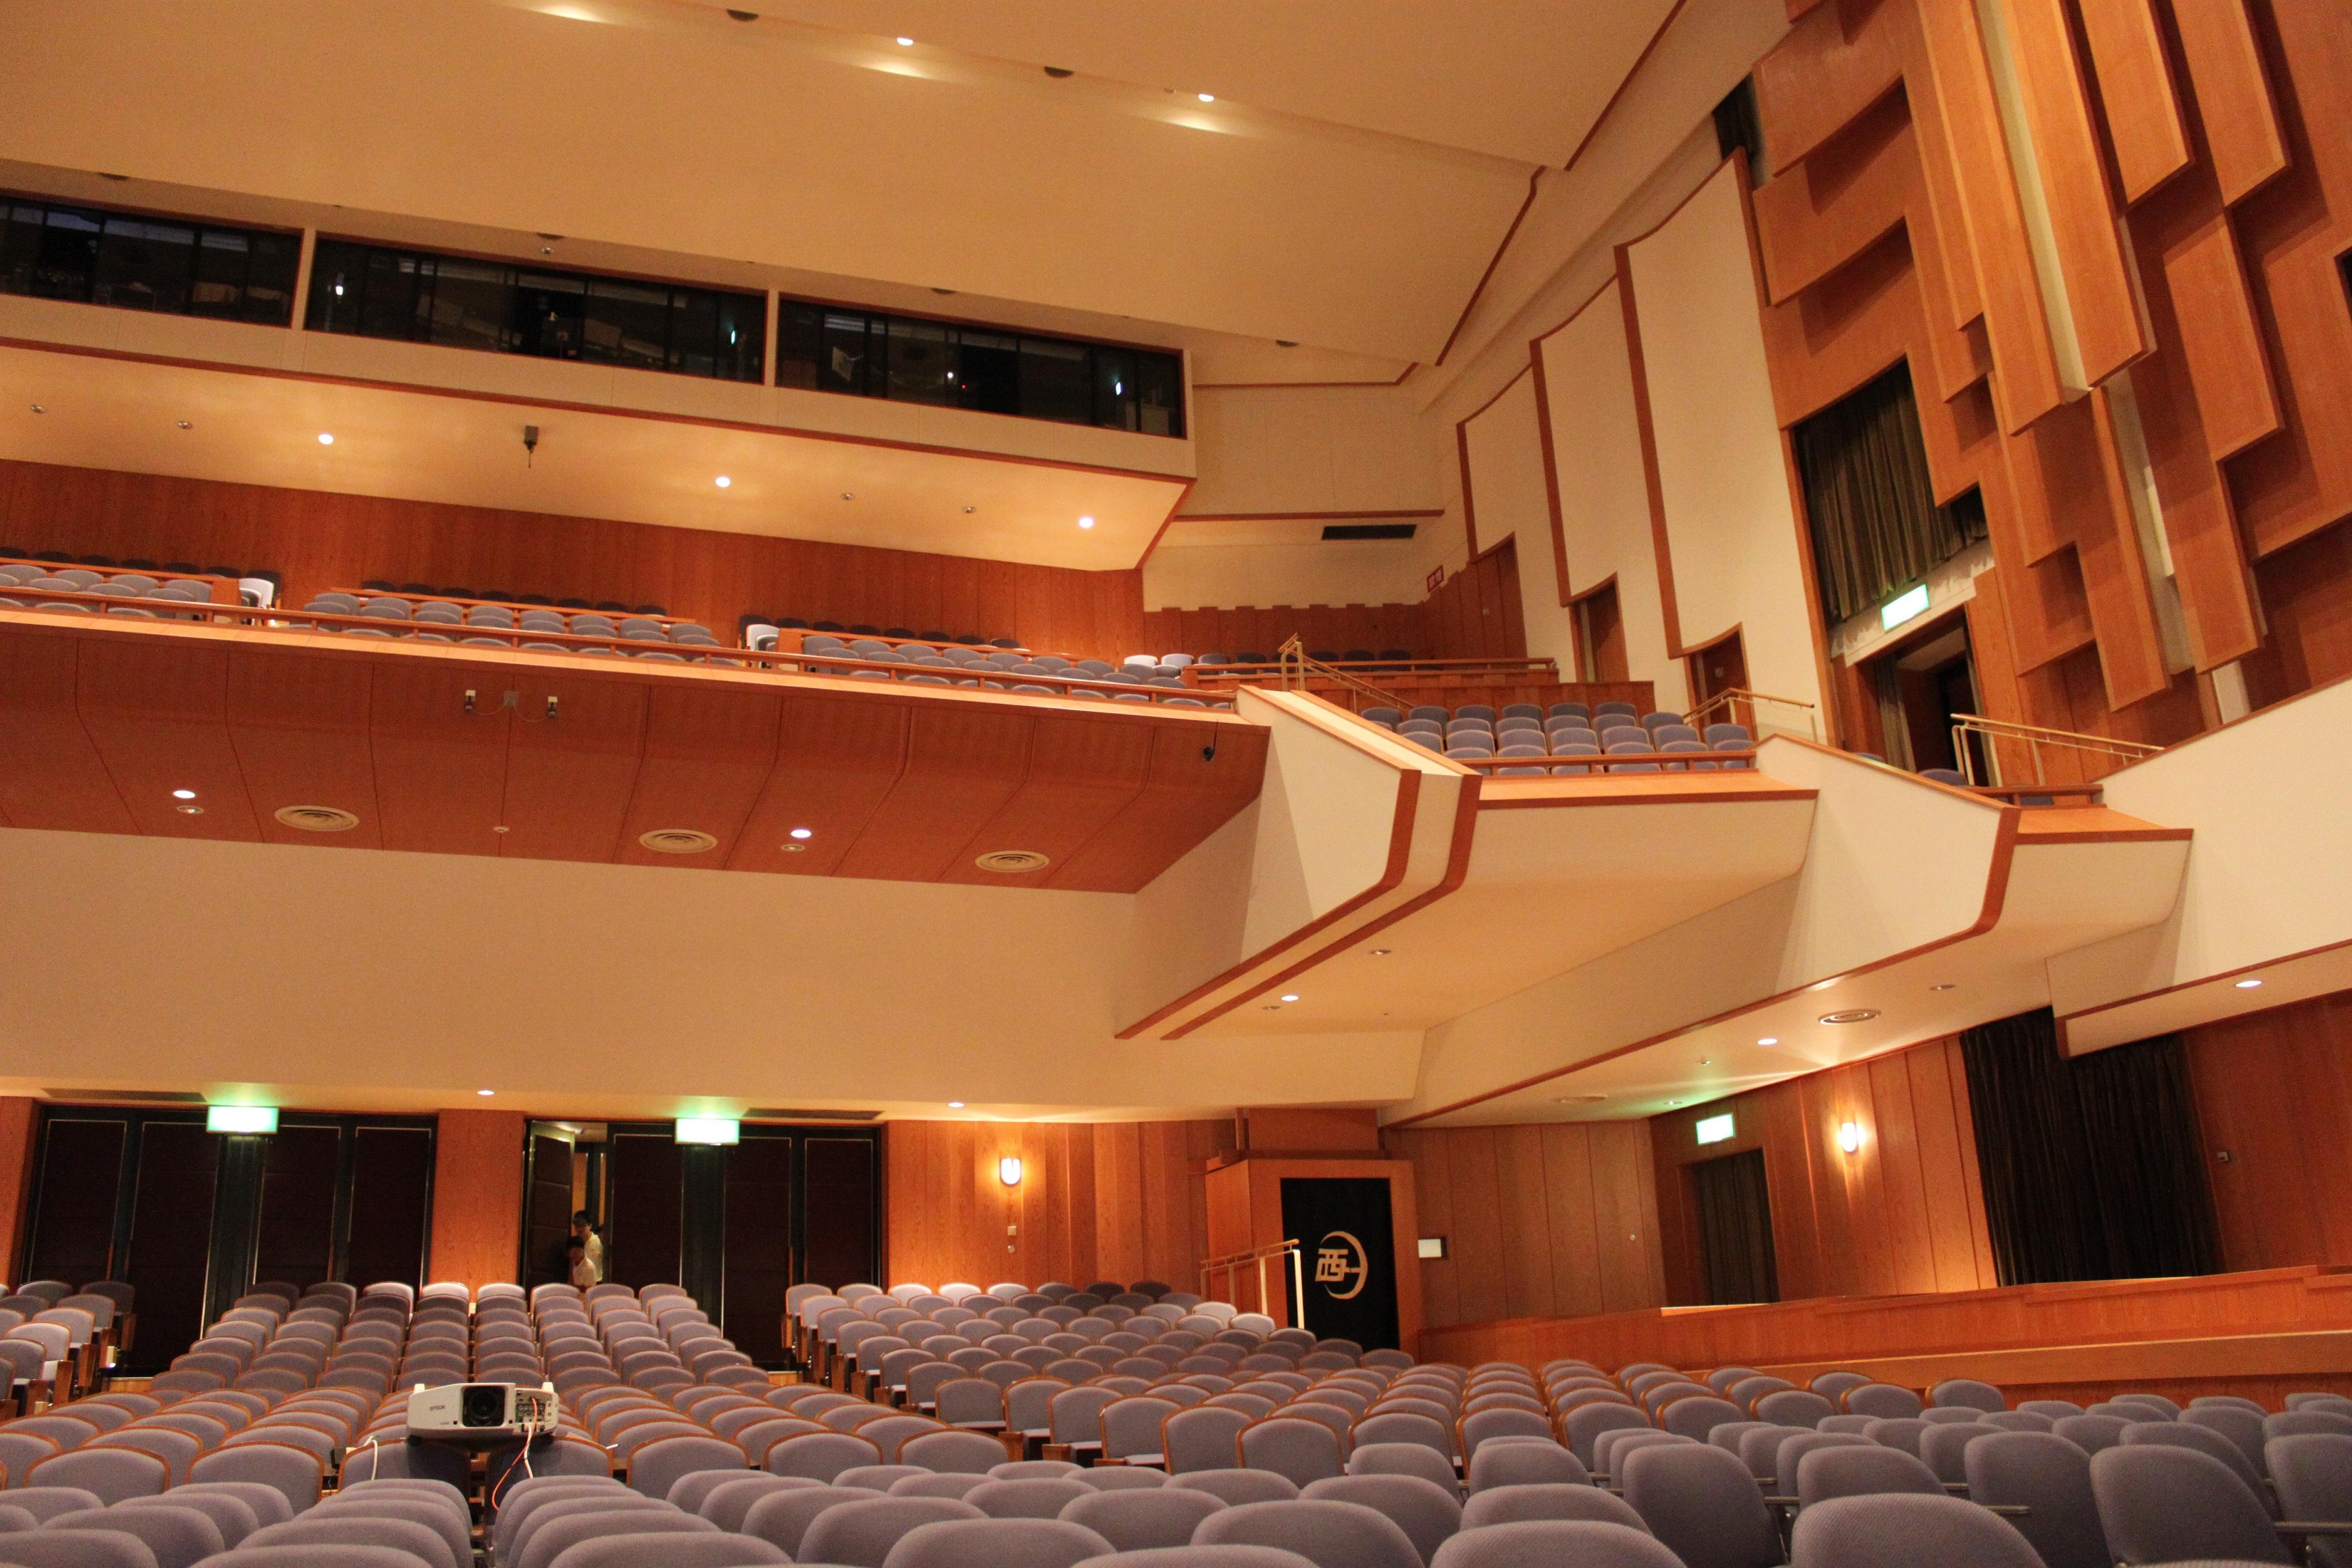 宇和文化会館大ホール